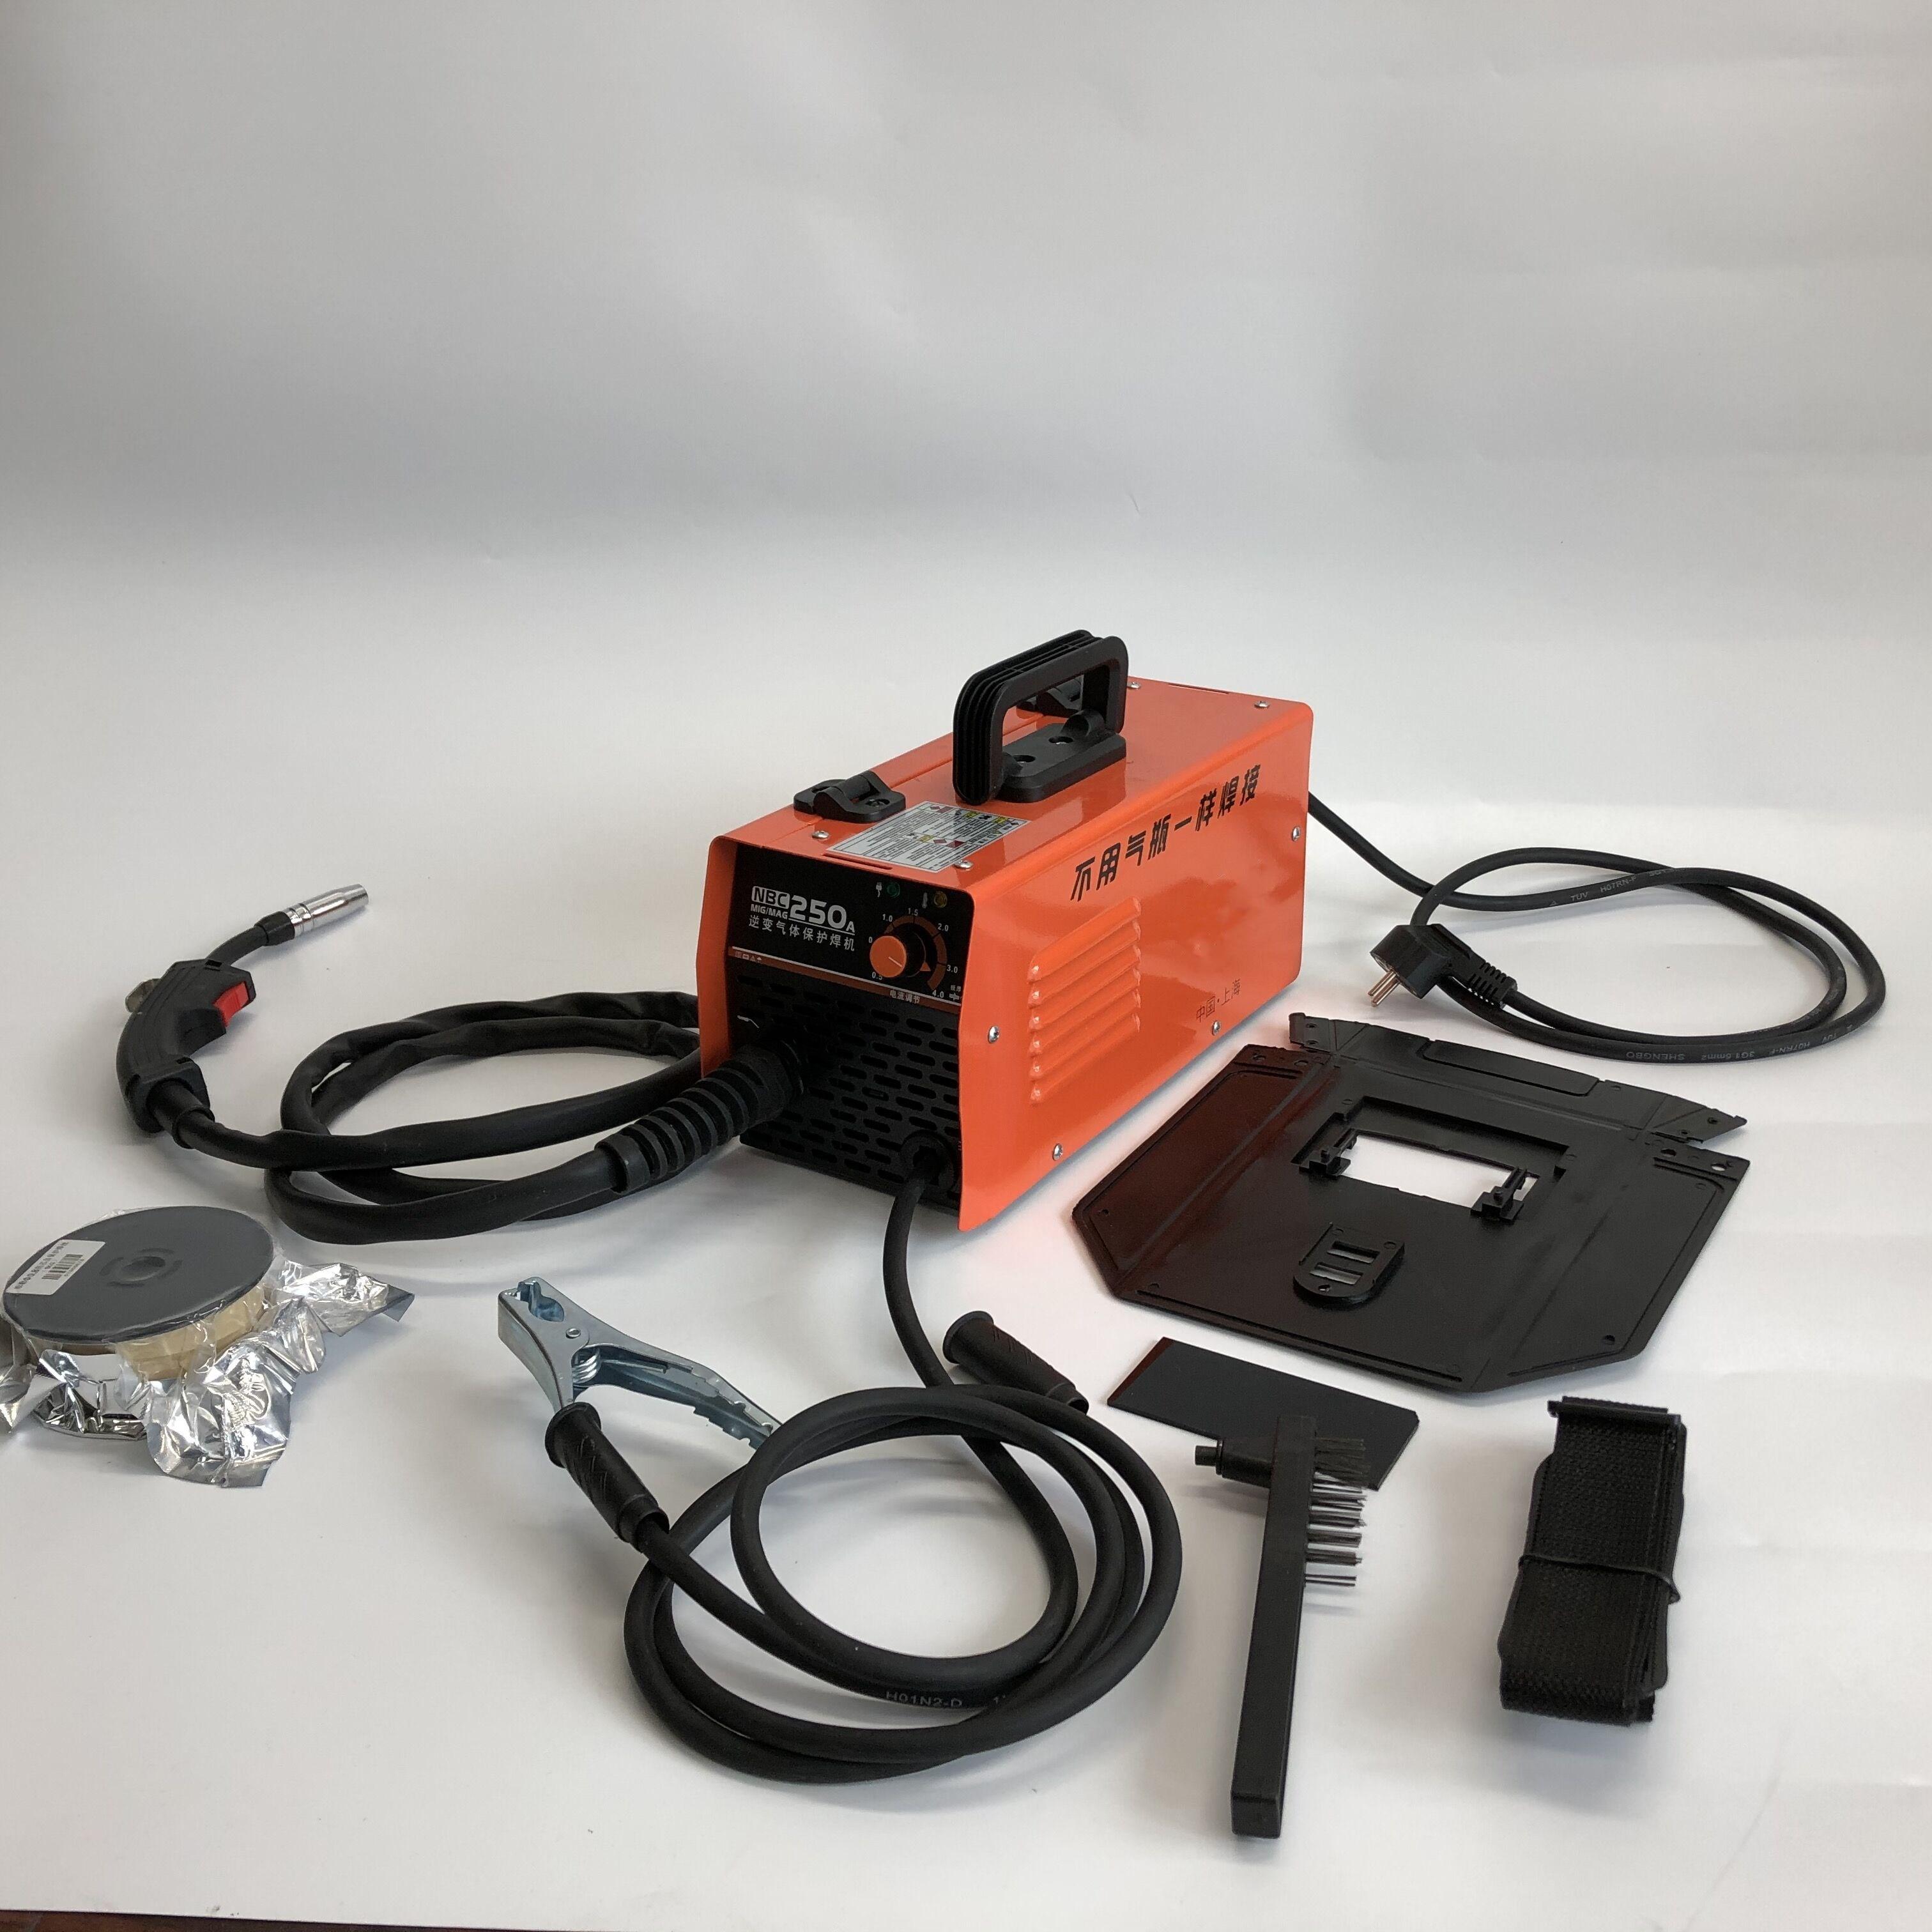 RU التسليم 220 فولت المنزلية بدون هواء اثنين من واقية لحام كهربائي ثاني أكسيد الكربون الغاز محمية لحام كهربائي 5.5KW